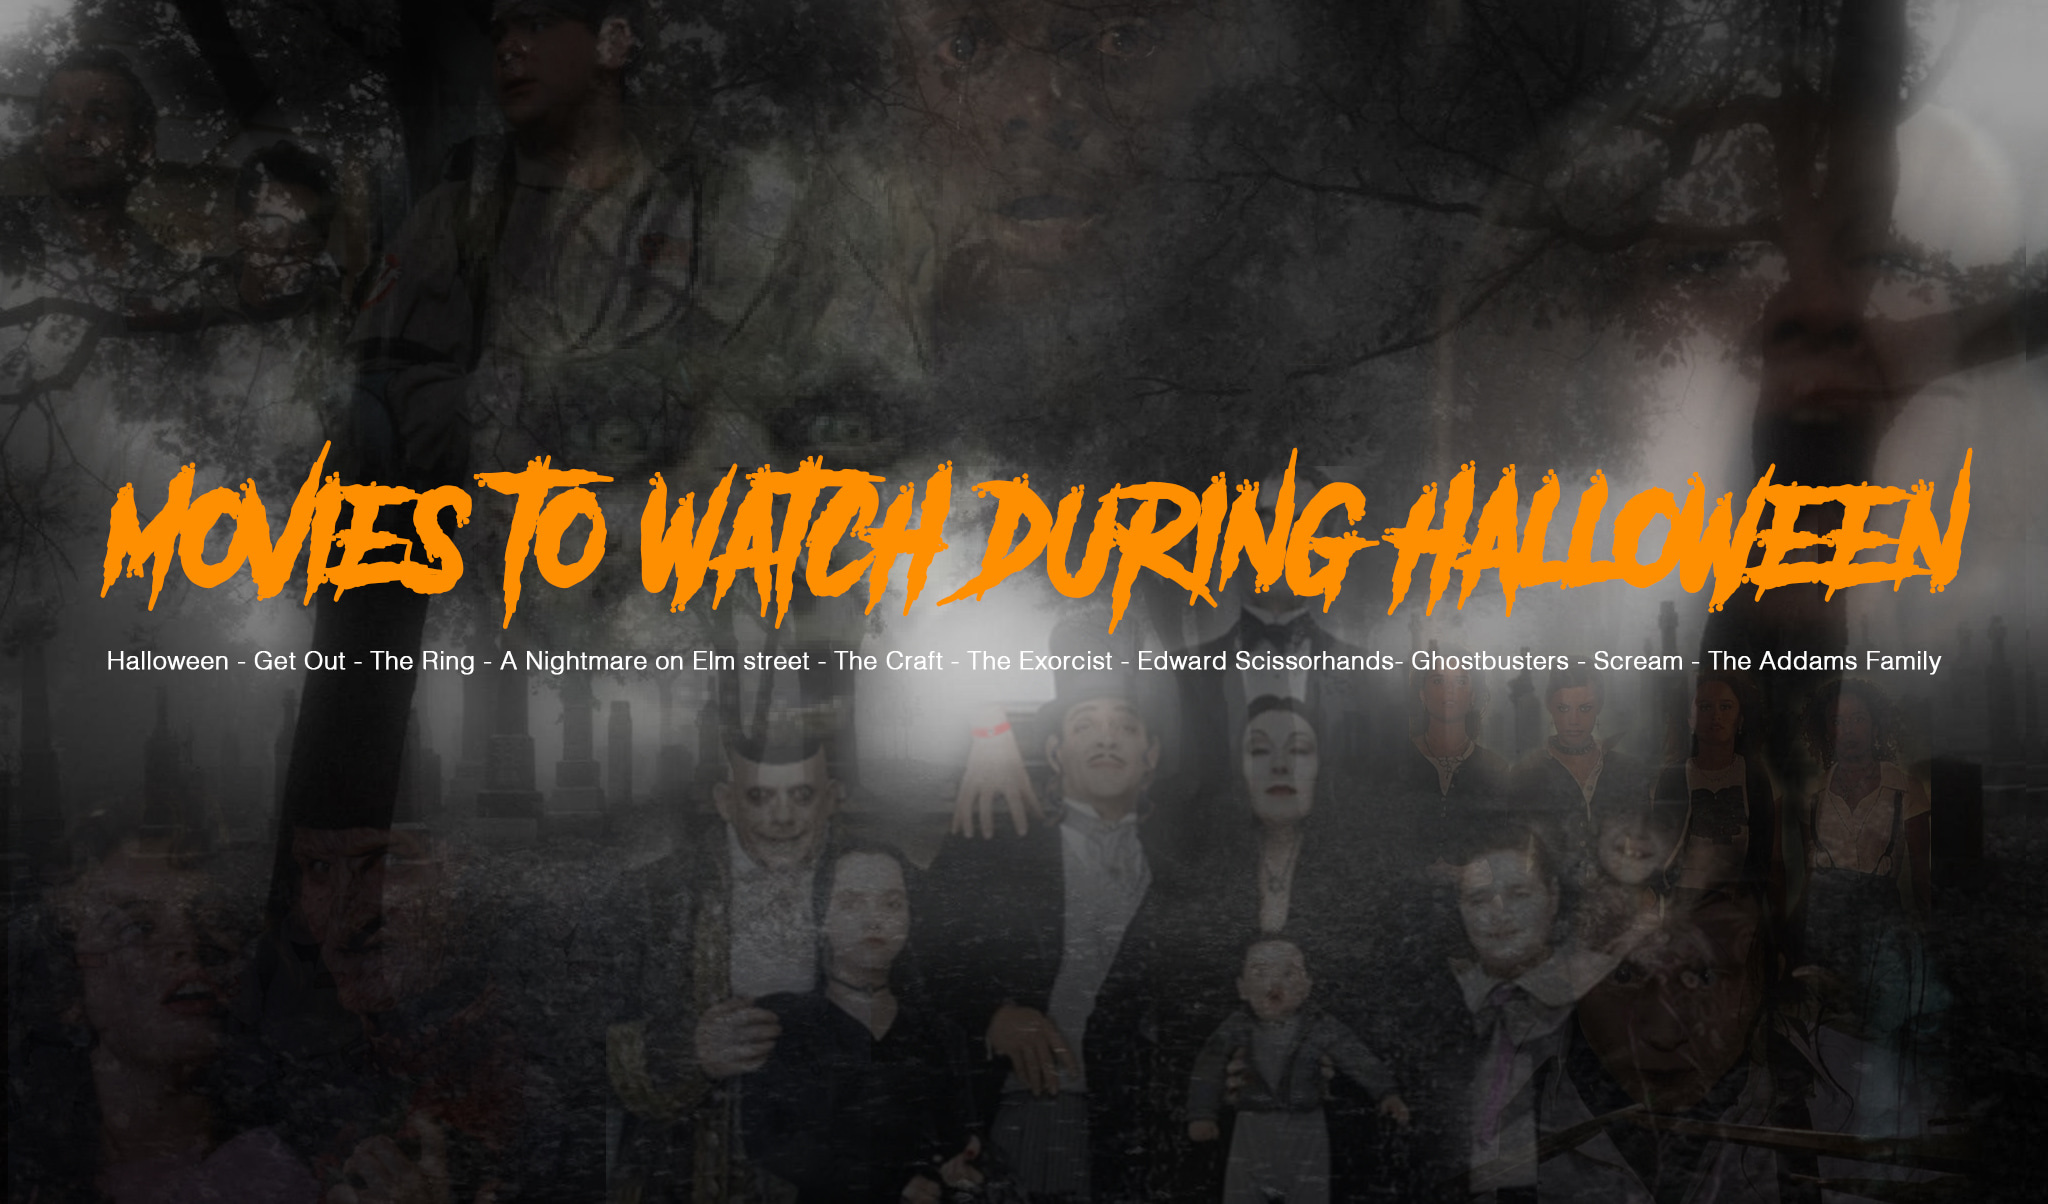 10 classic Halloween films